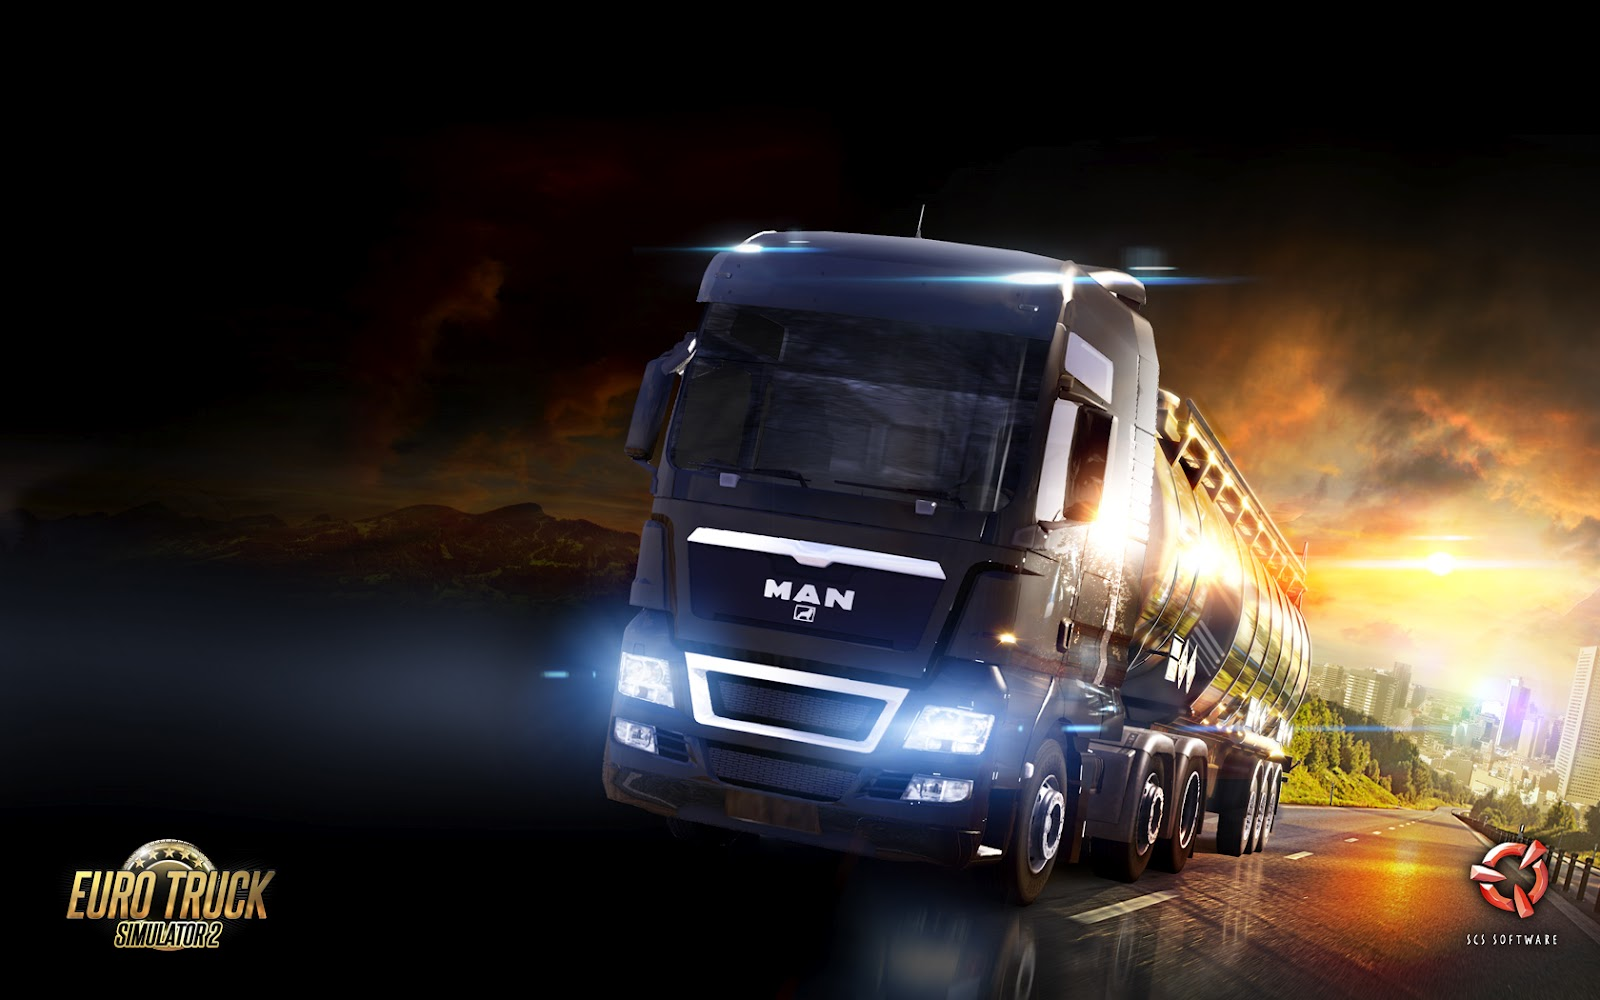 Man in Euro Truck Simulator 2